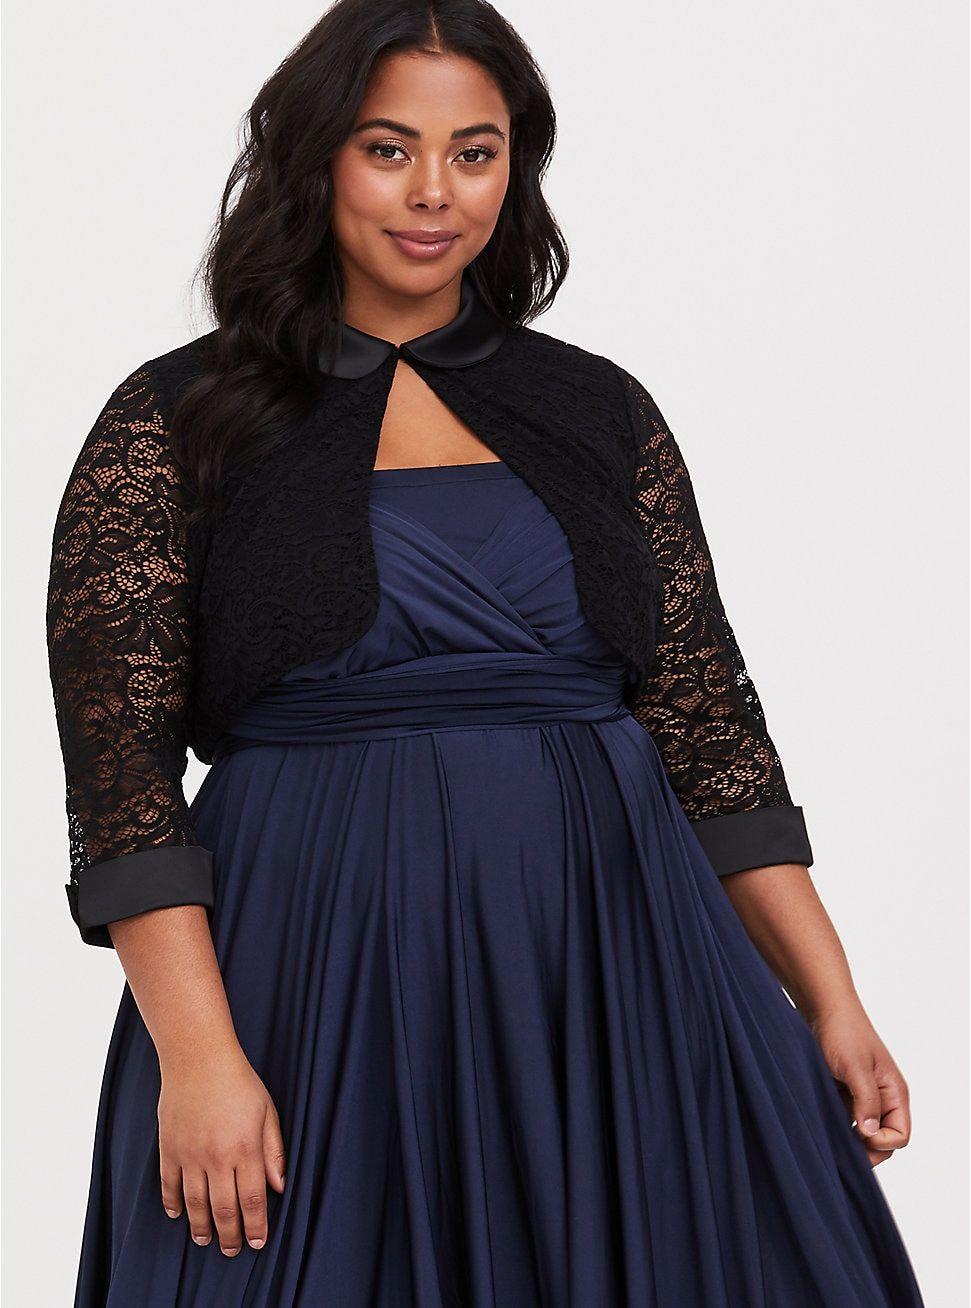 Retro Chic Black Lace Shrug | Sweaters | Lace shrug, Lace, Shrug for ...